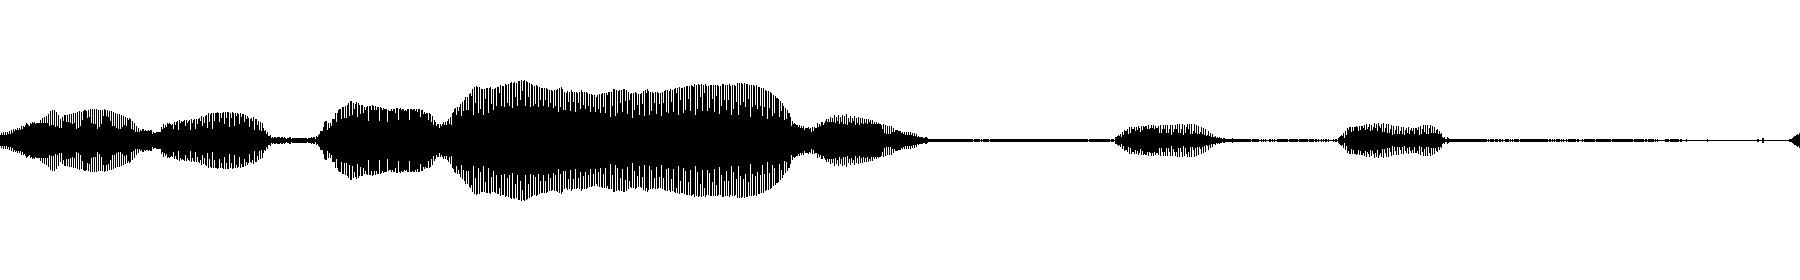 without echo singing